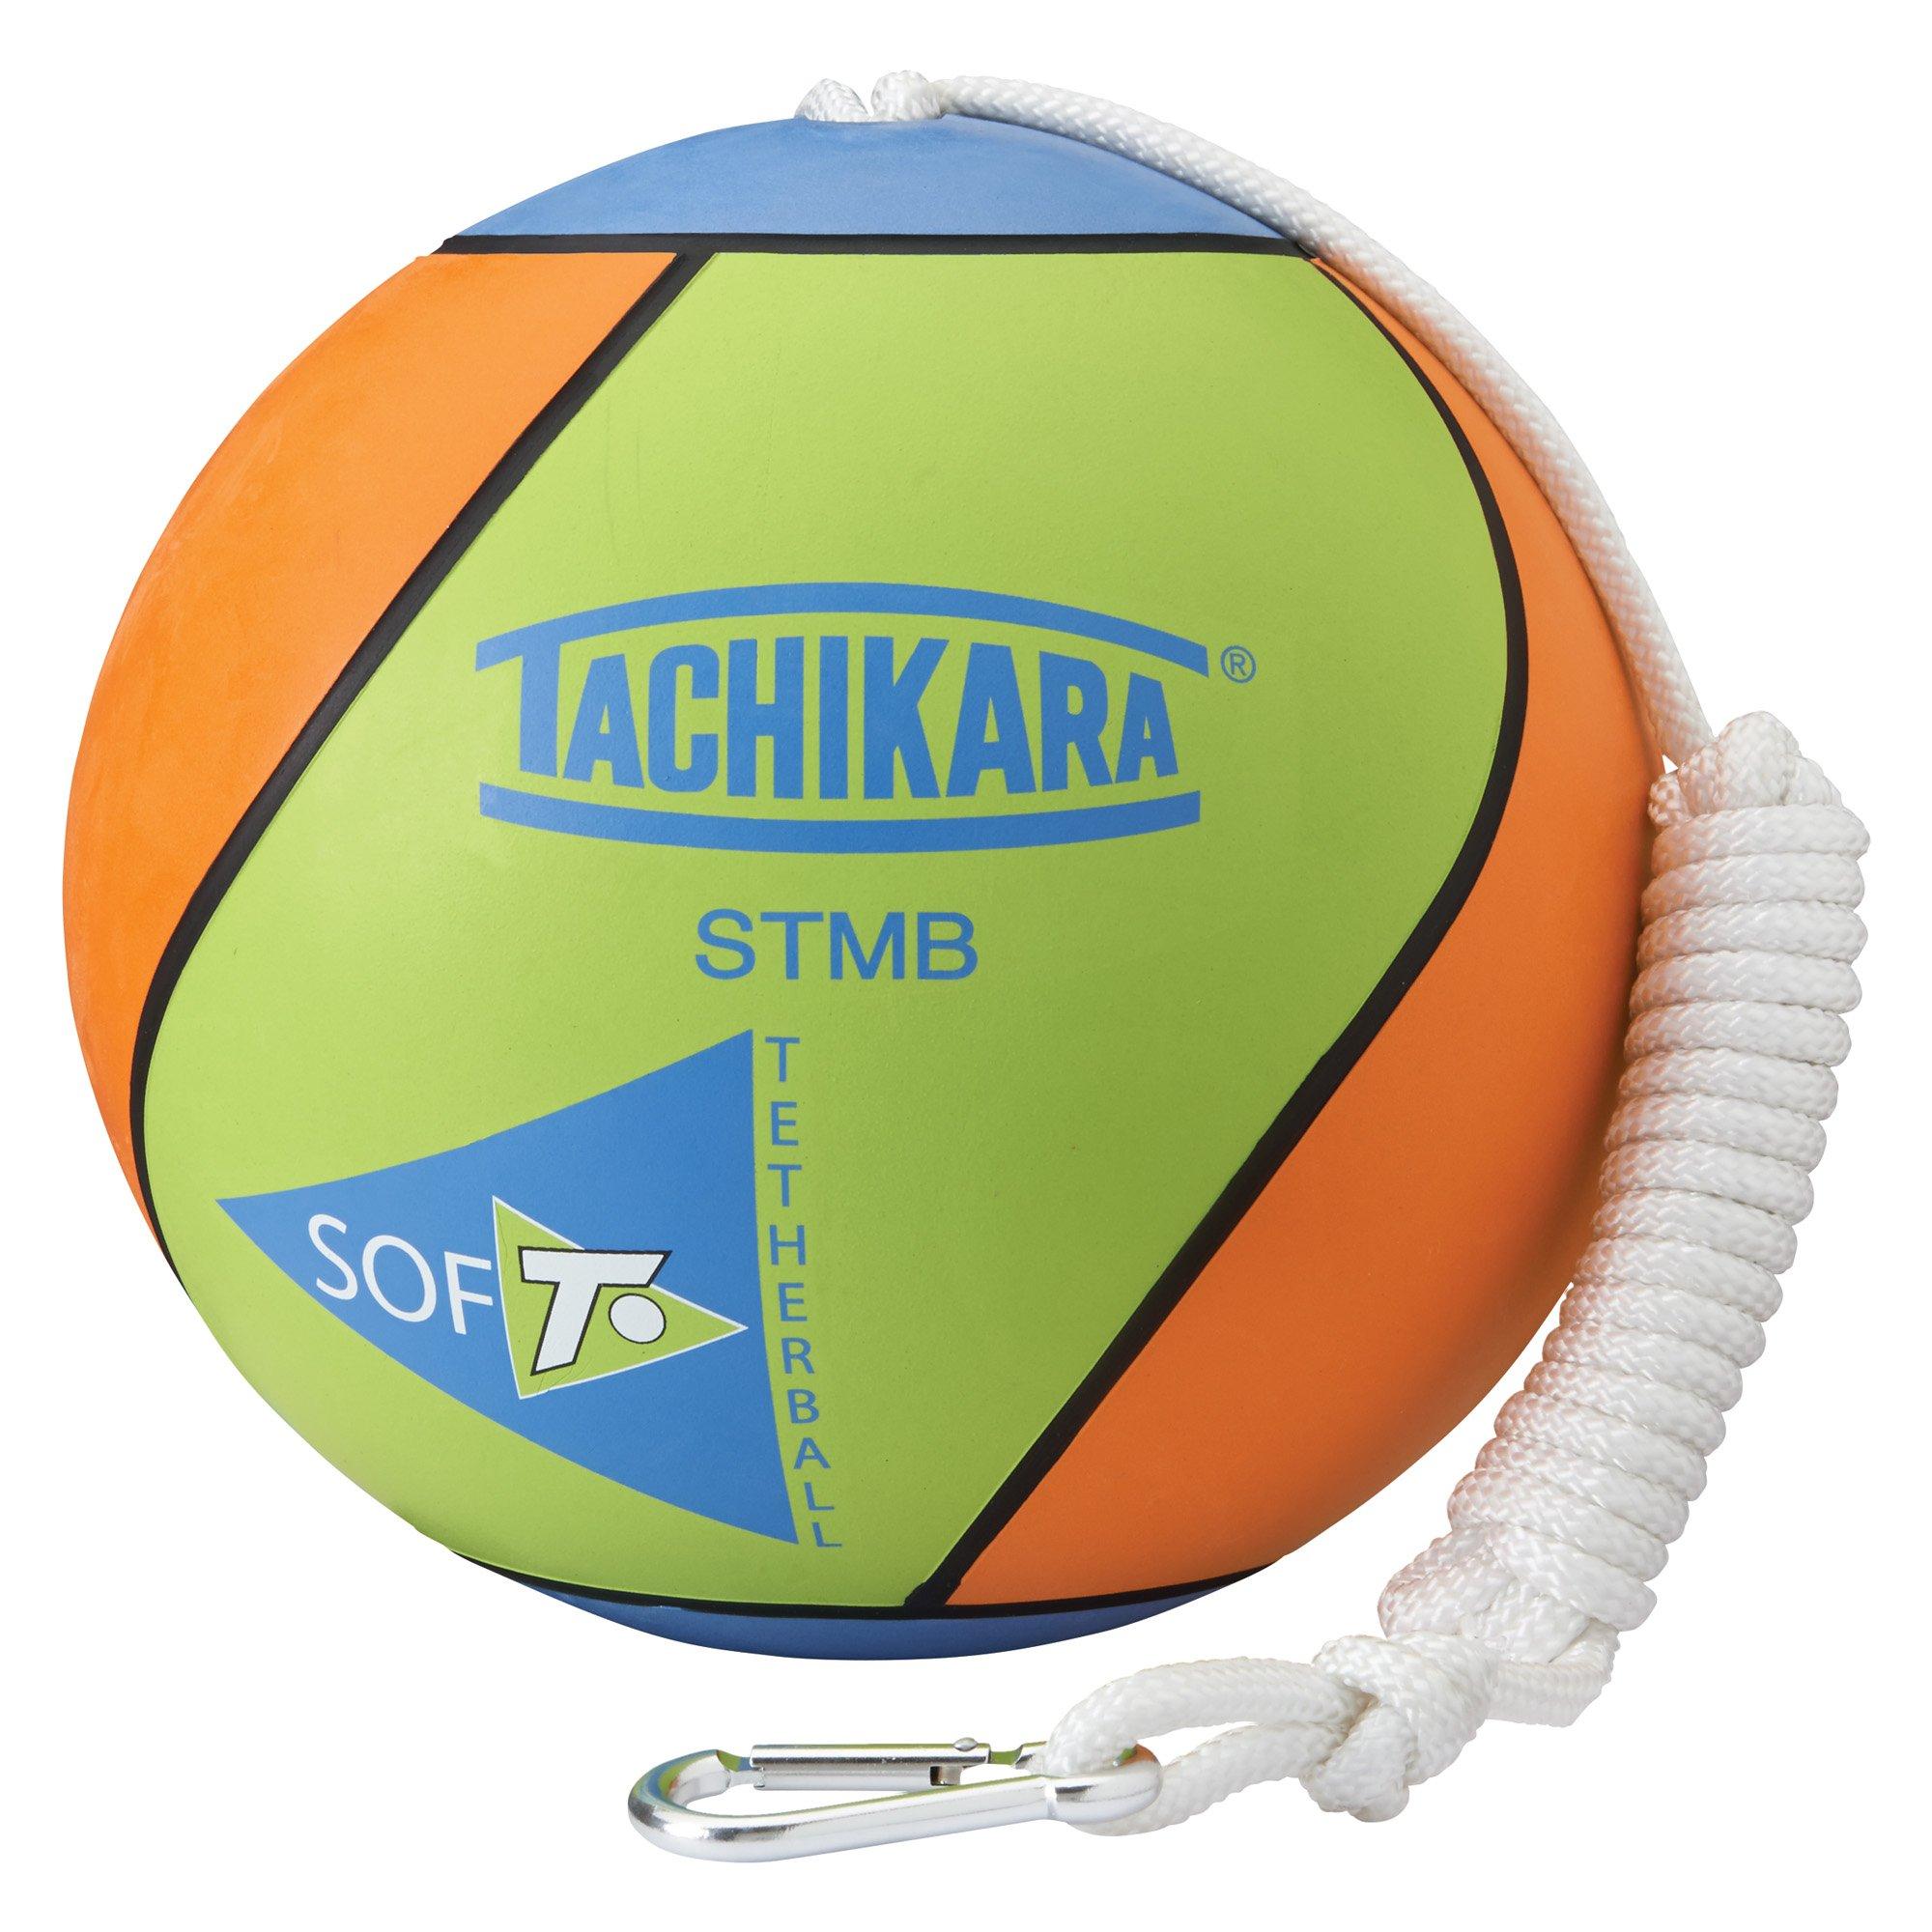 Tachikara STMB Extra Soft Tetherball (Gold/Royal/Scarlet). by Tachikara